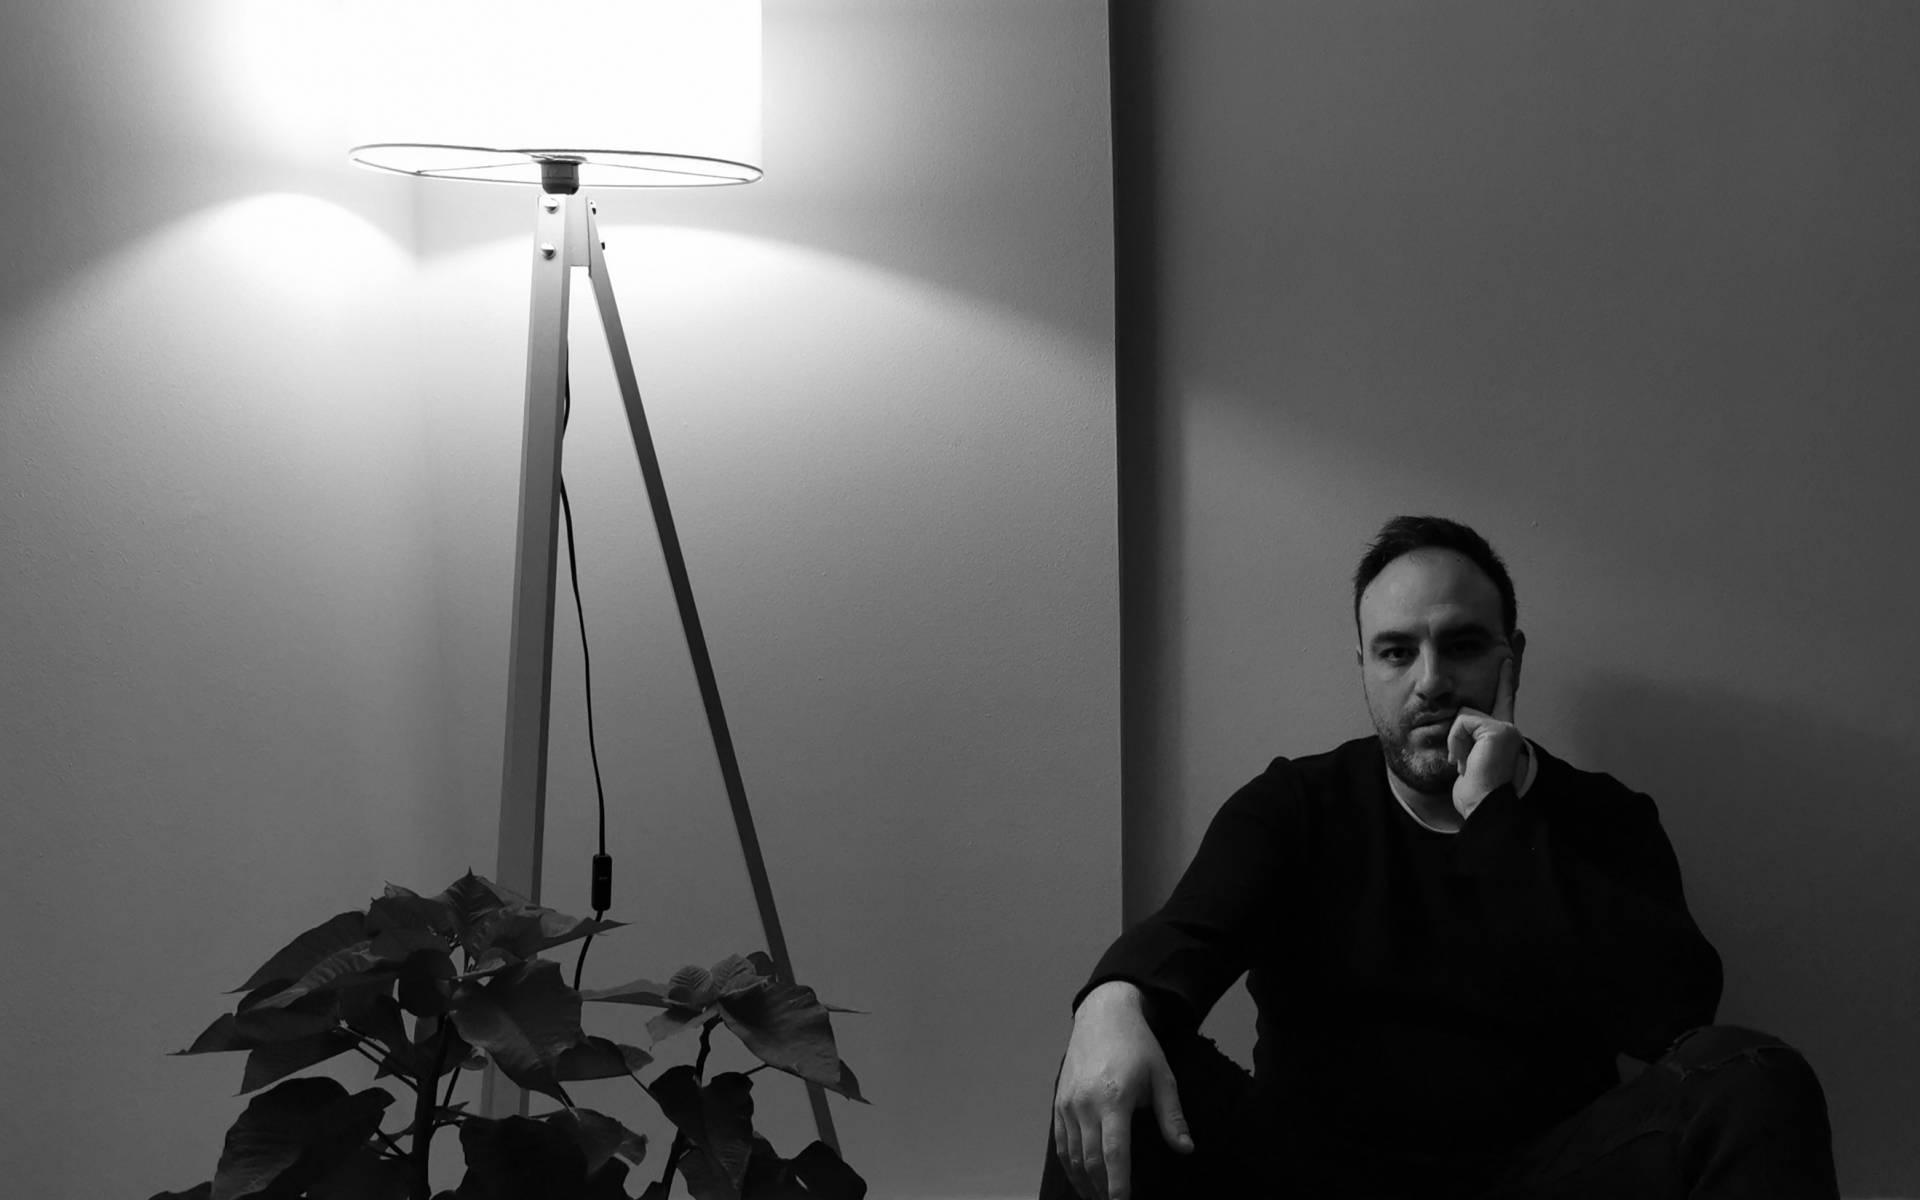 A quick talk with Alexskyspirit